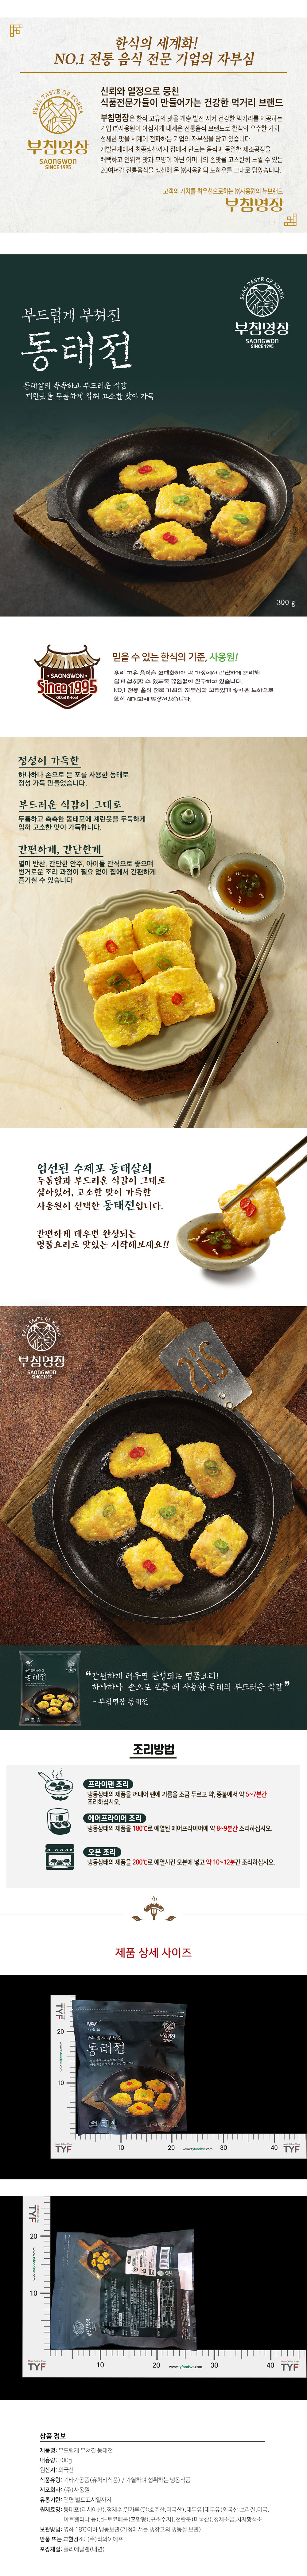 saongwon_dongtaejeon.jpg